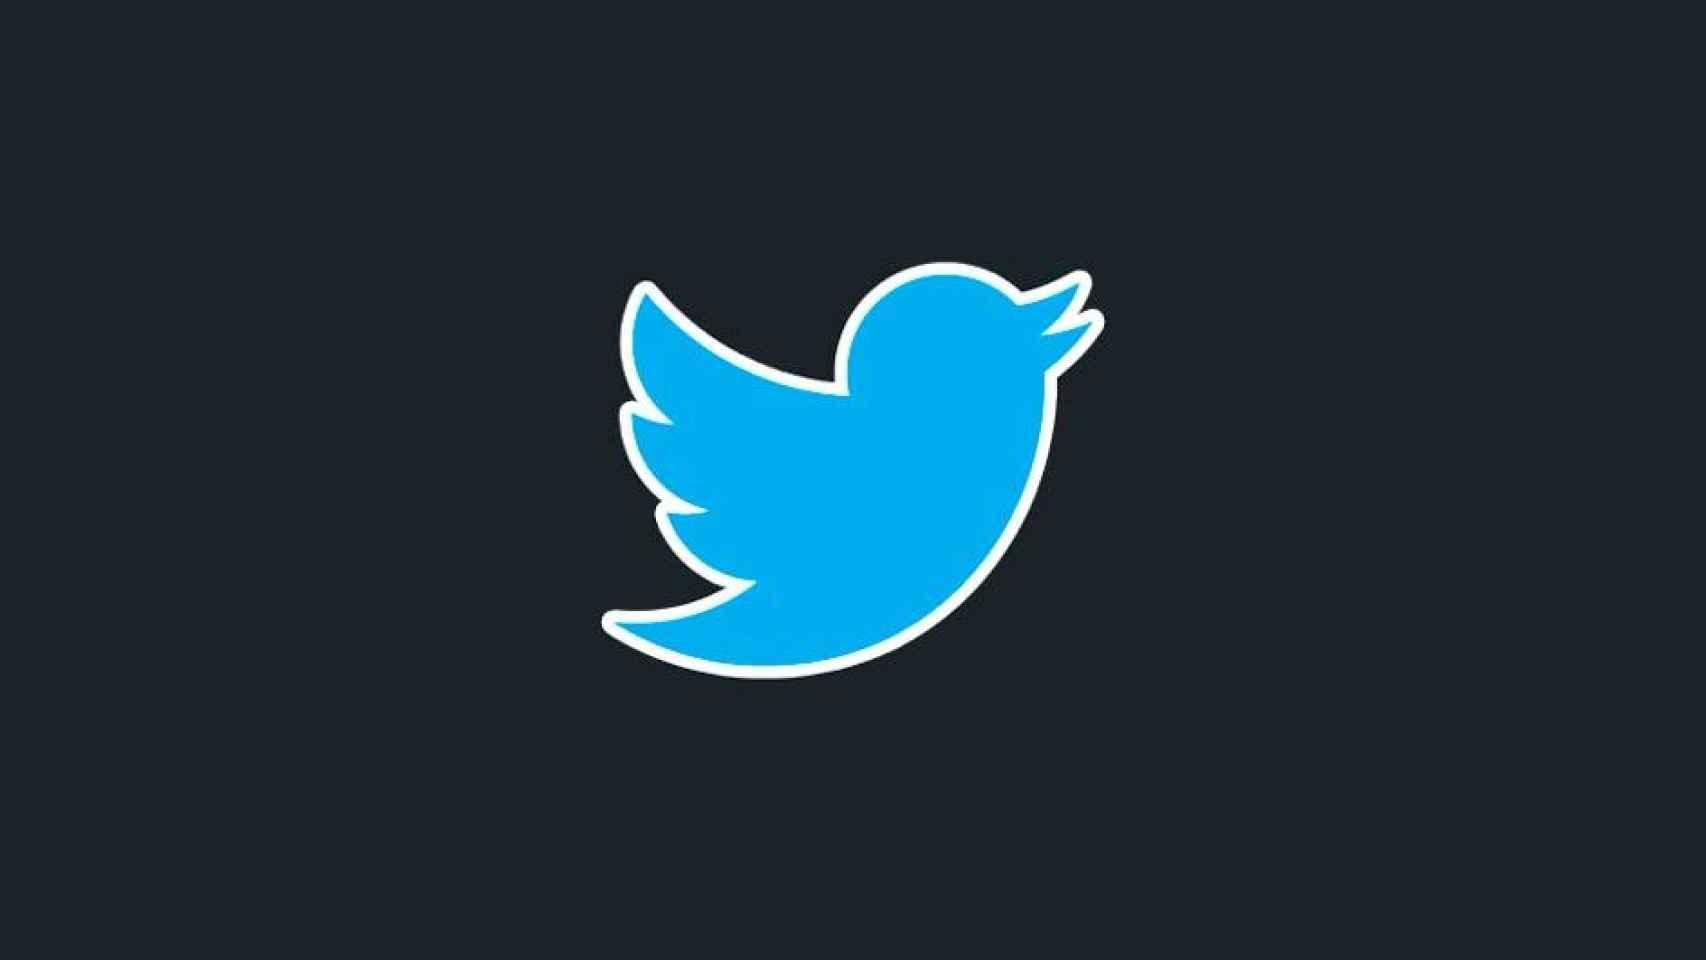 Twitter.